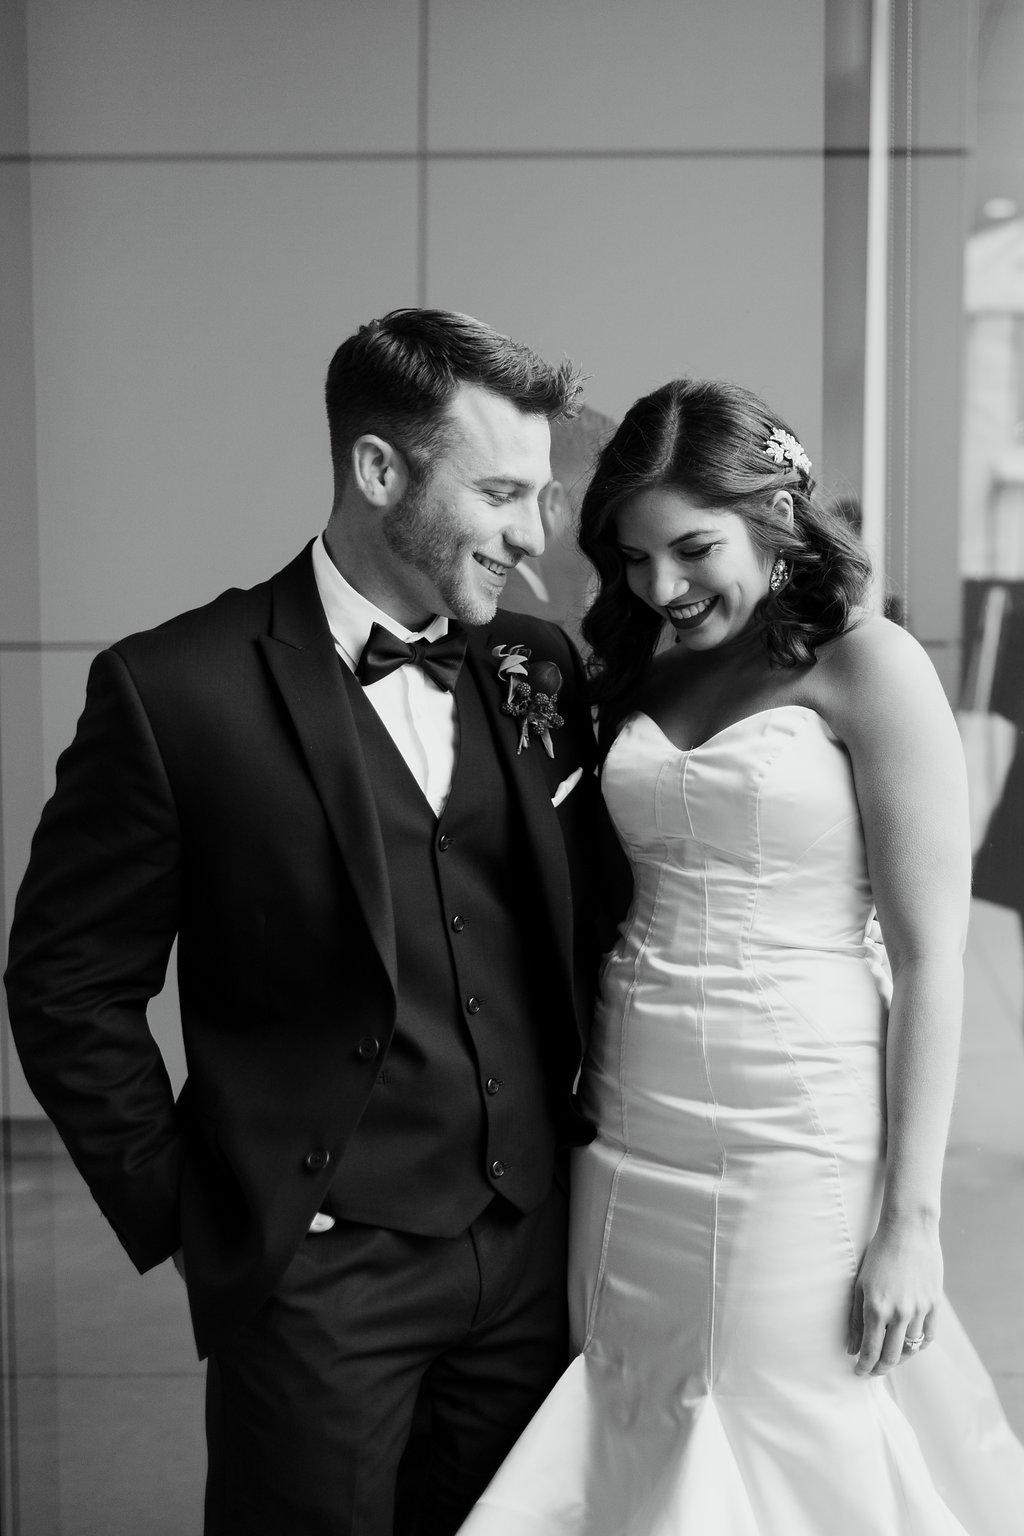 Paige-Newton-Photography-W-Hotel-Wedding-Austin-Photographer0019.jpg